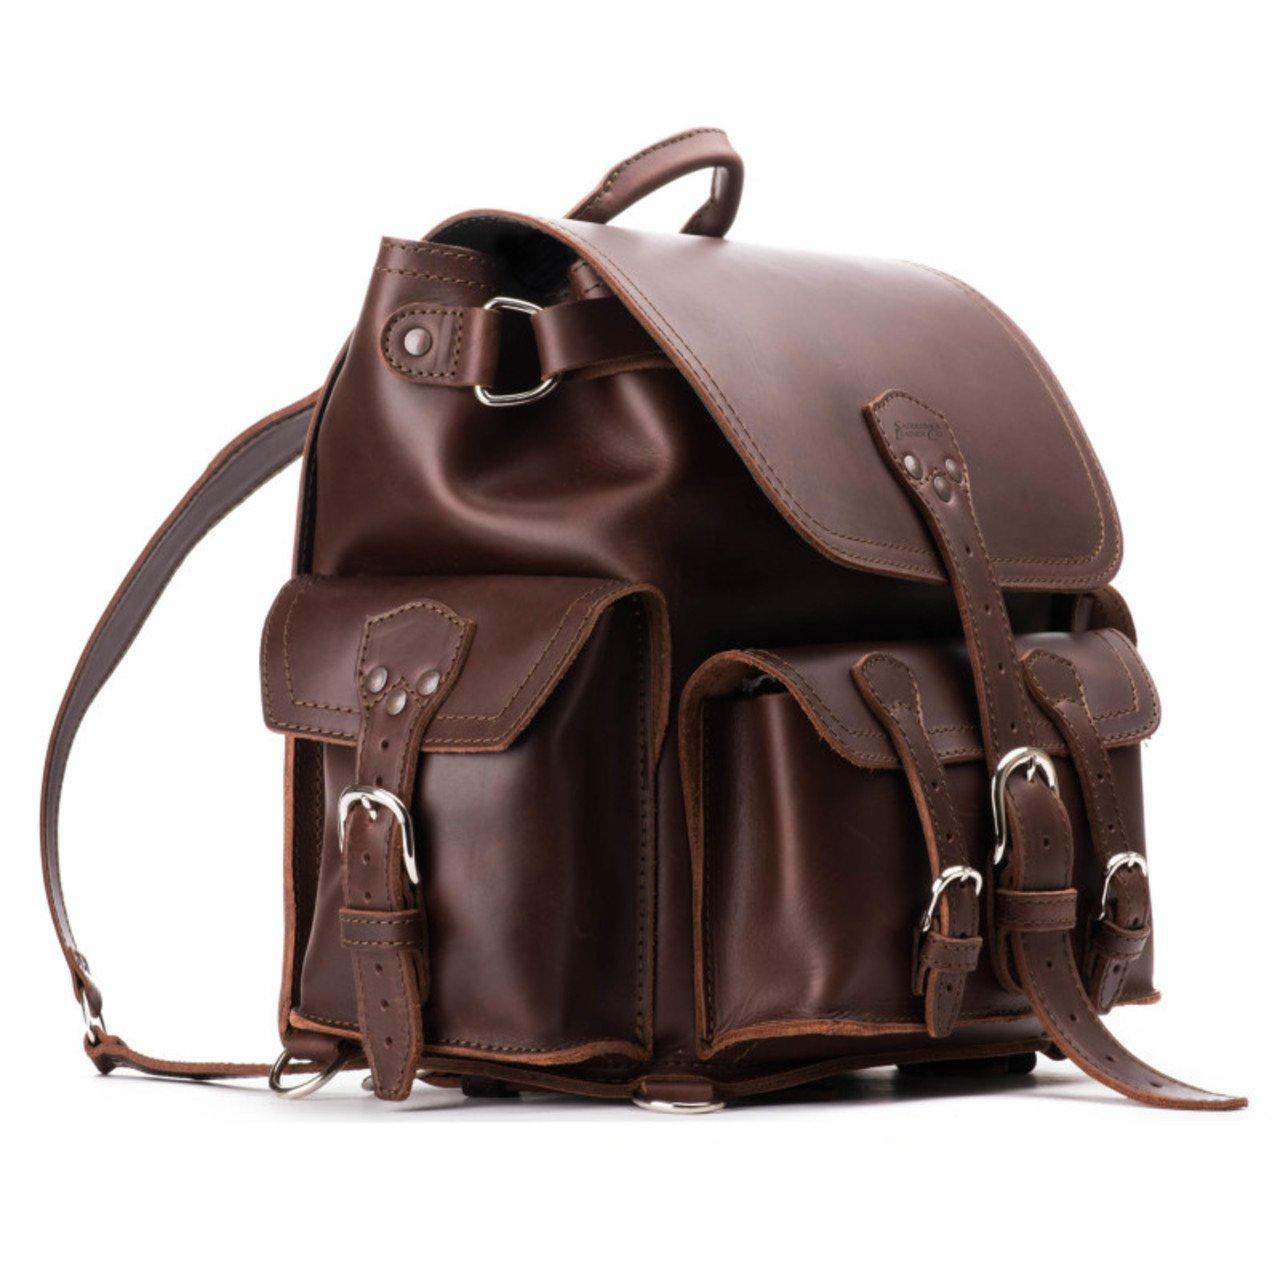 The Best Leather Travel Bag Money Can Buy Saddleback